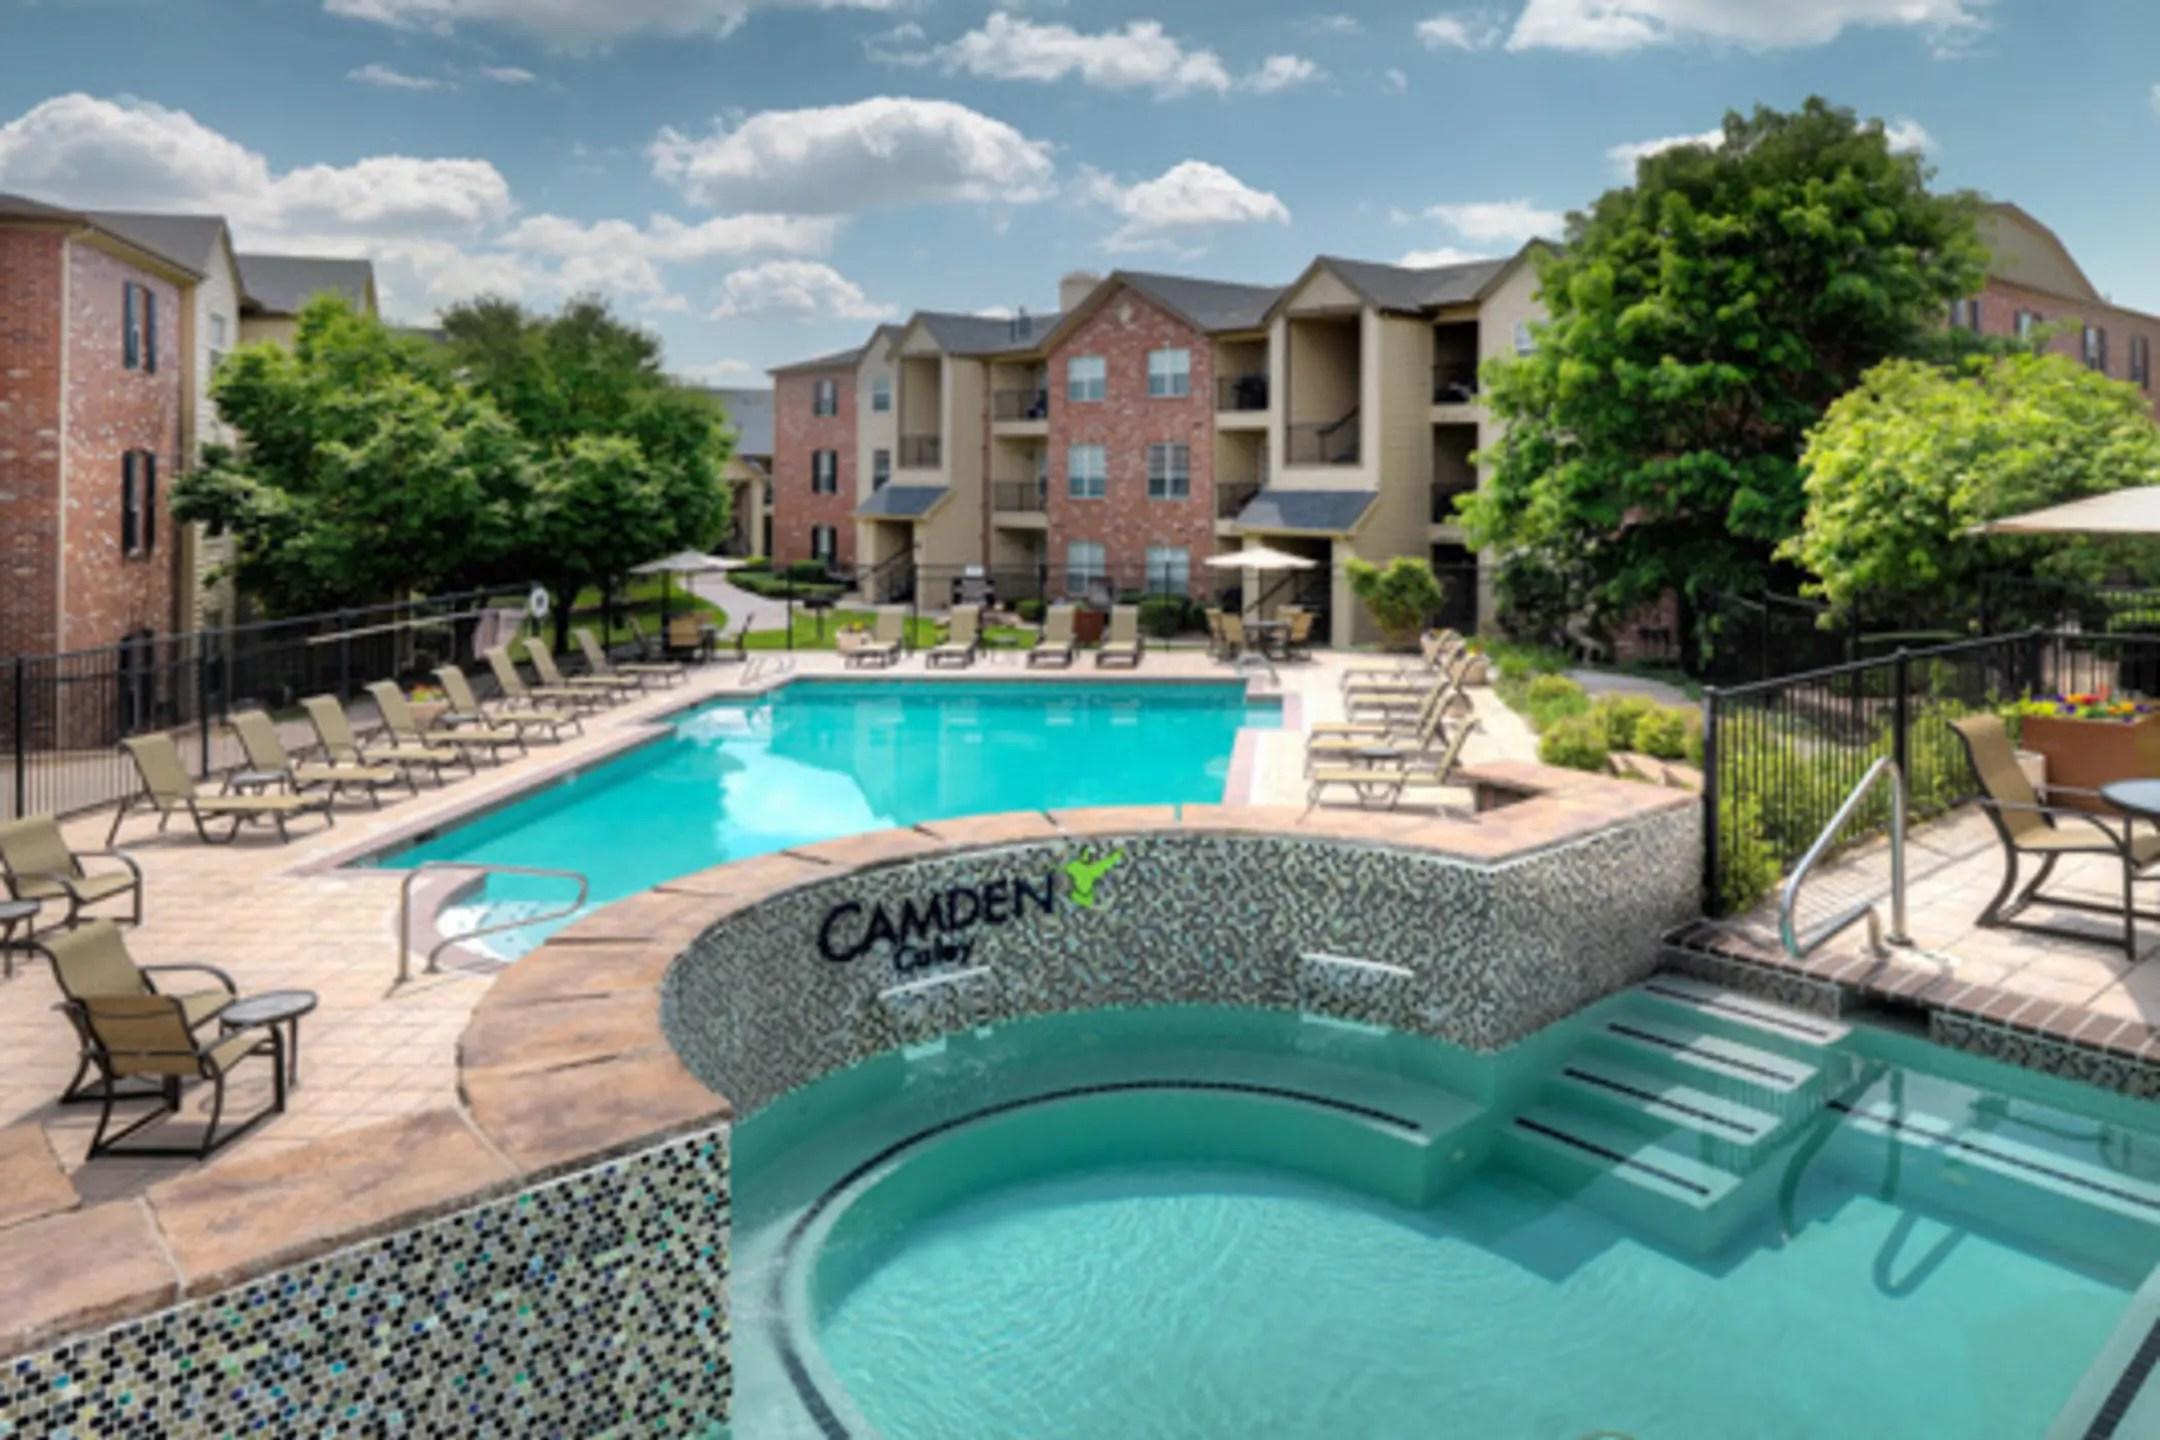 Camden Caley Apartments Englewood CO 80111